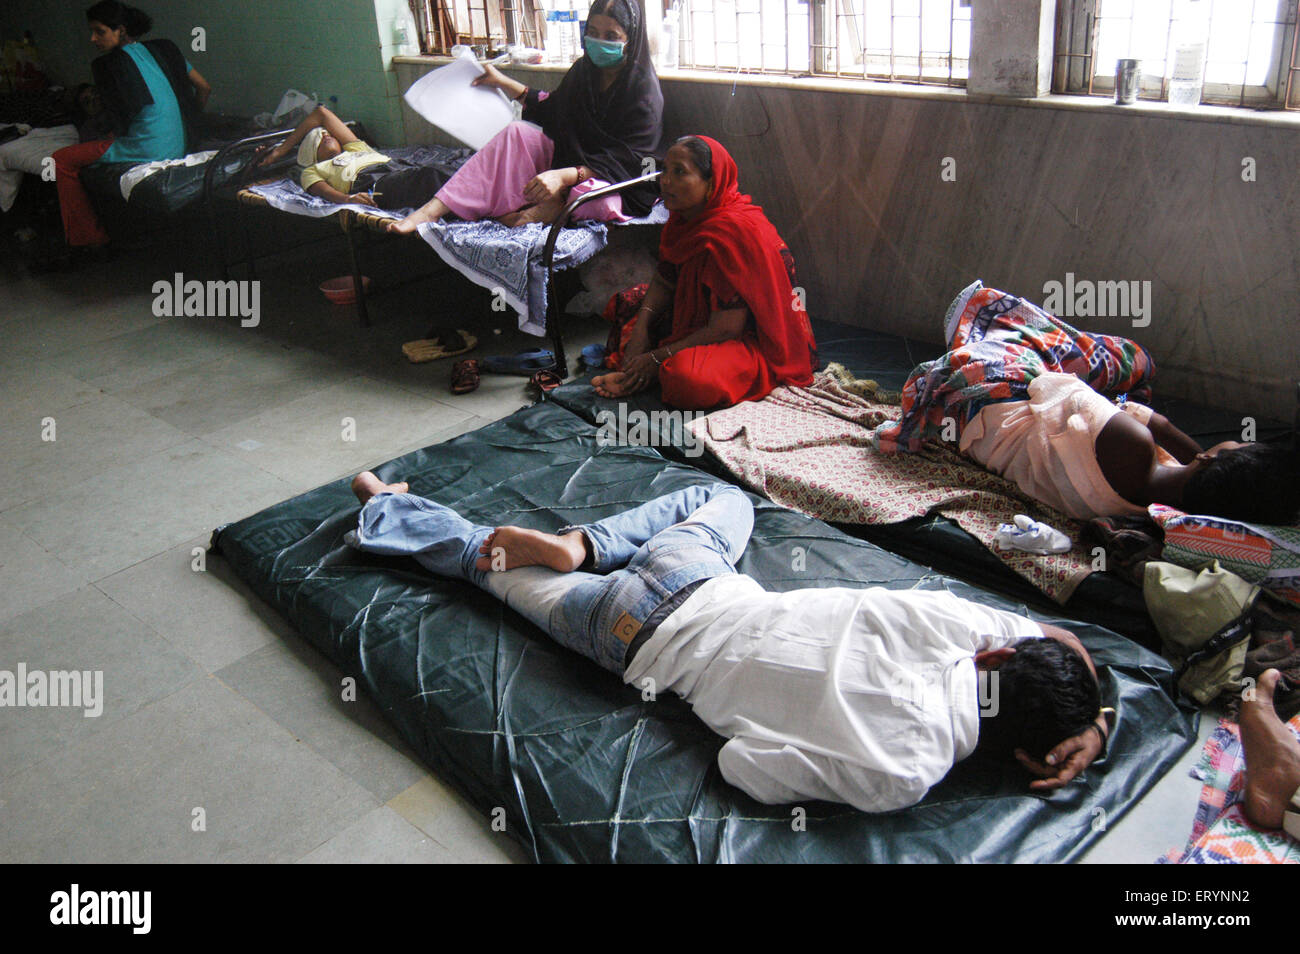 Floods India Stockfotos & Floods India Bilder - Alamy